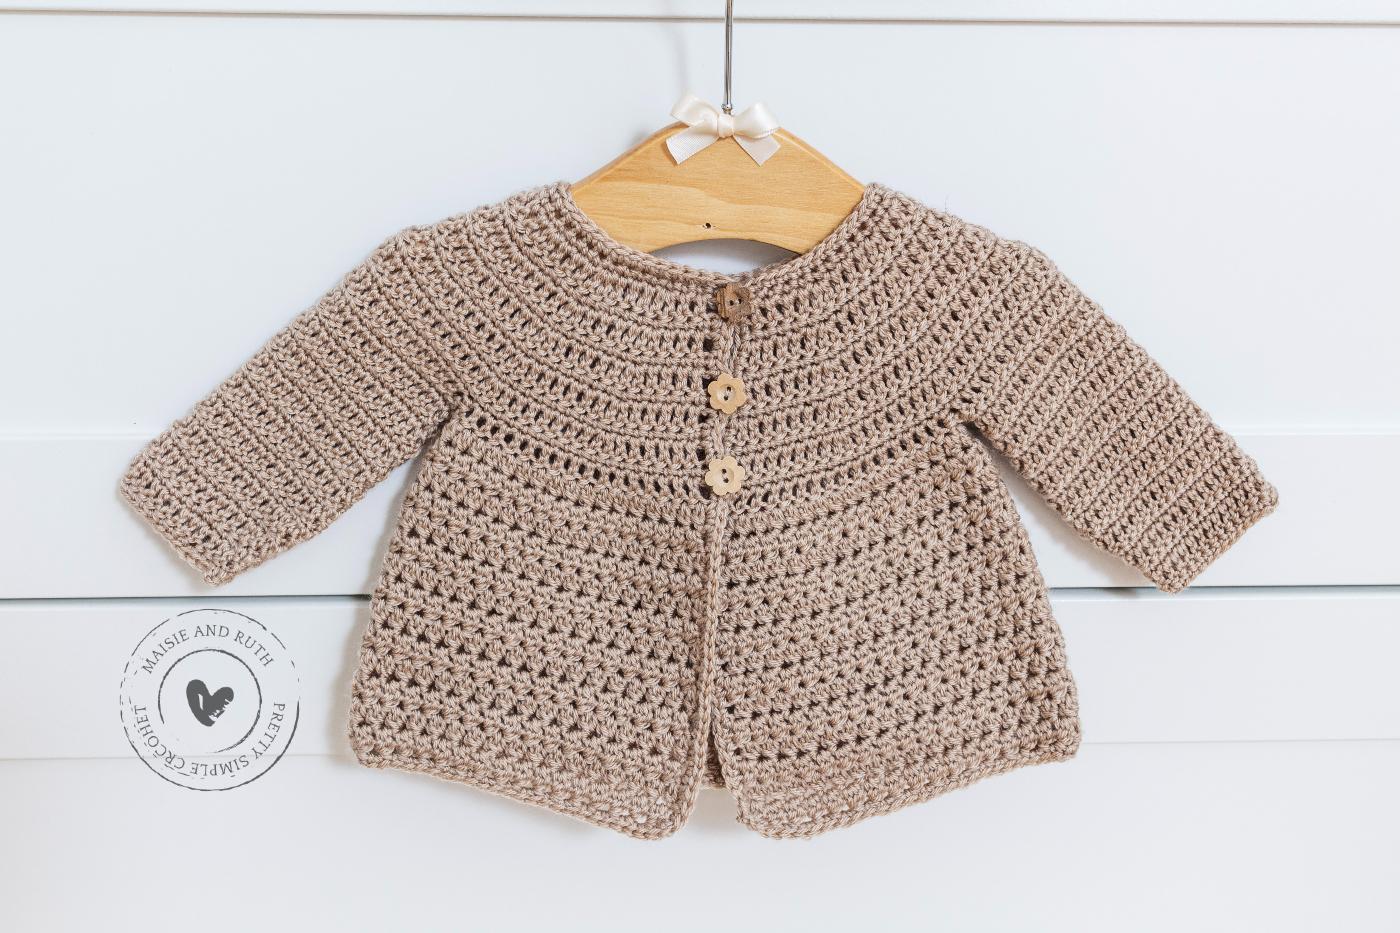 Crochet Baby Cardigan Pattern Hanging on drawers